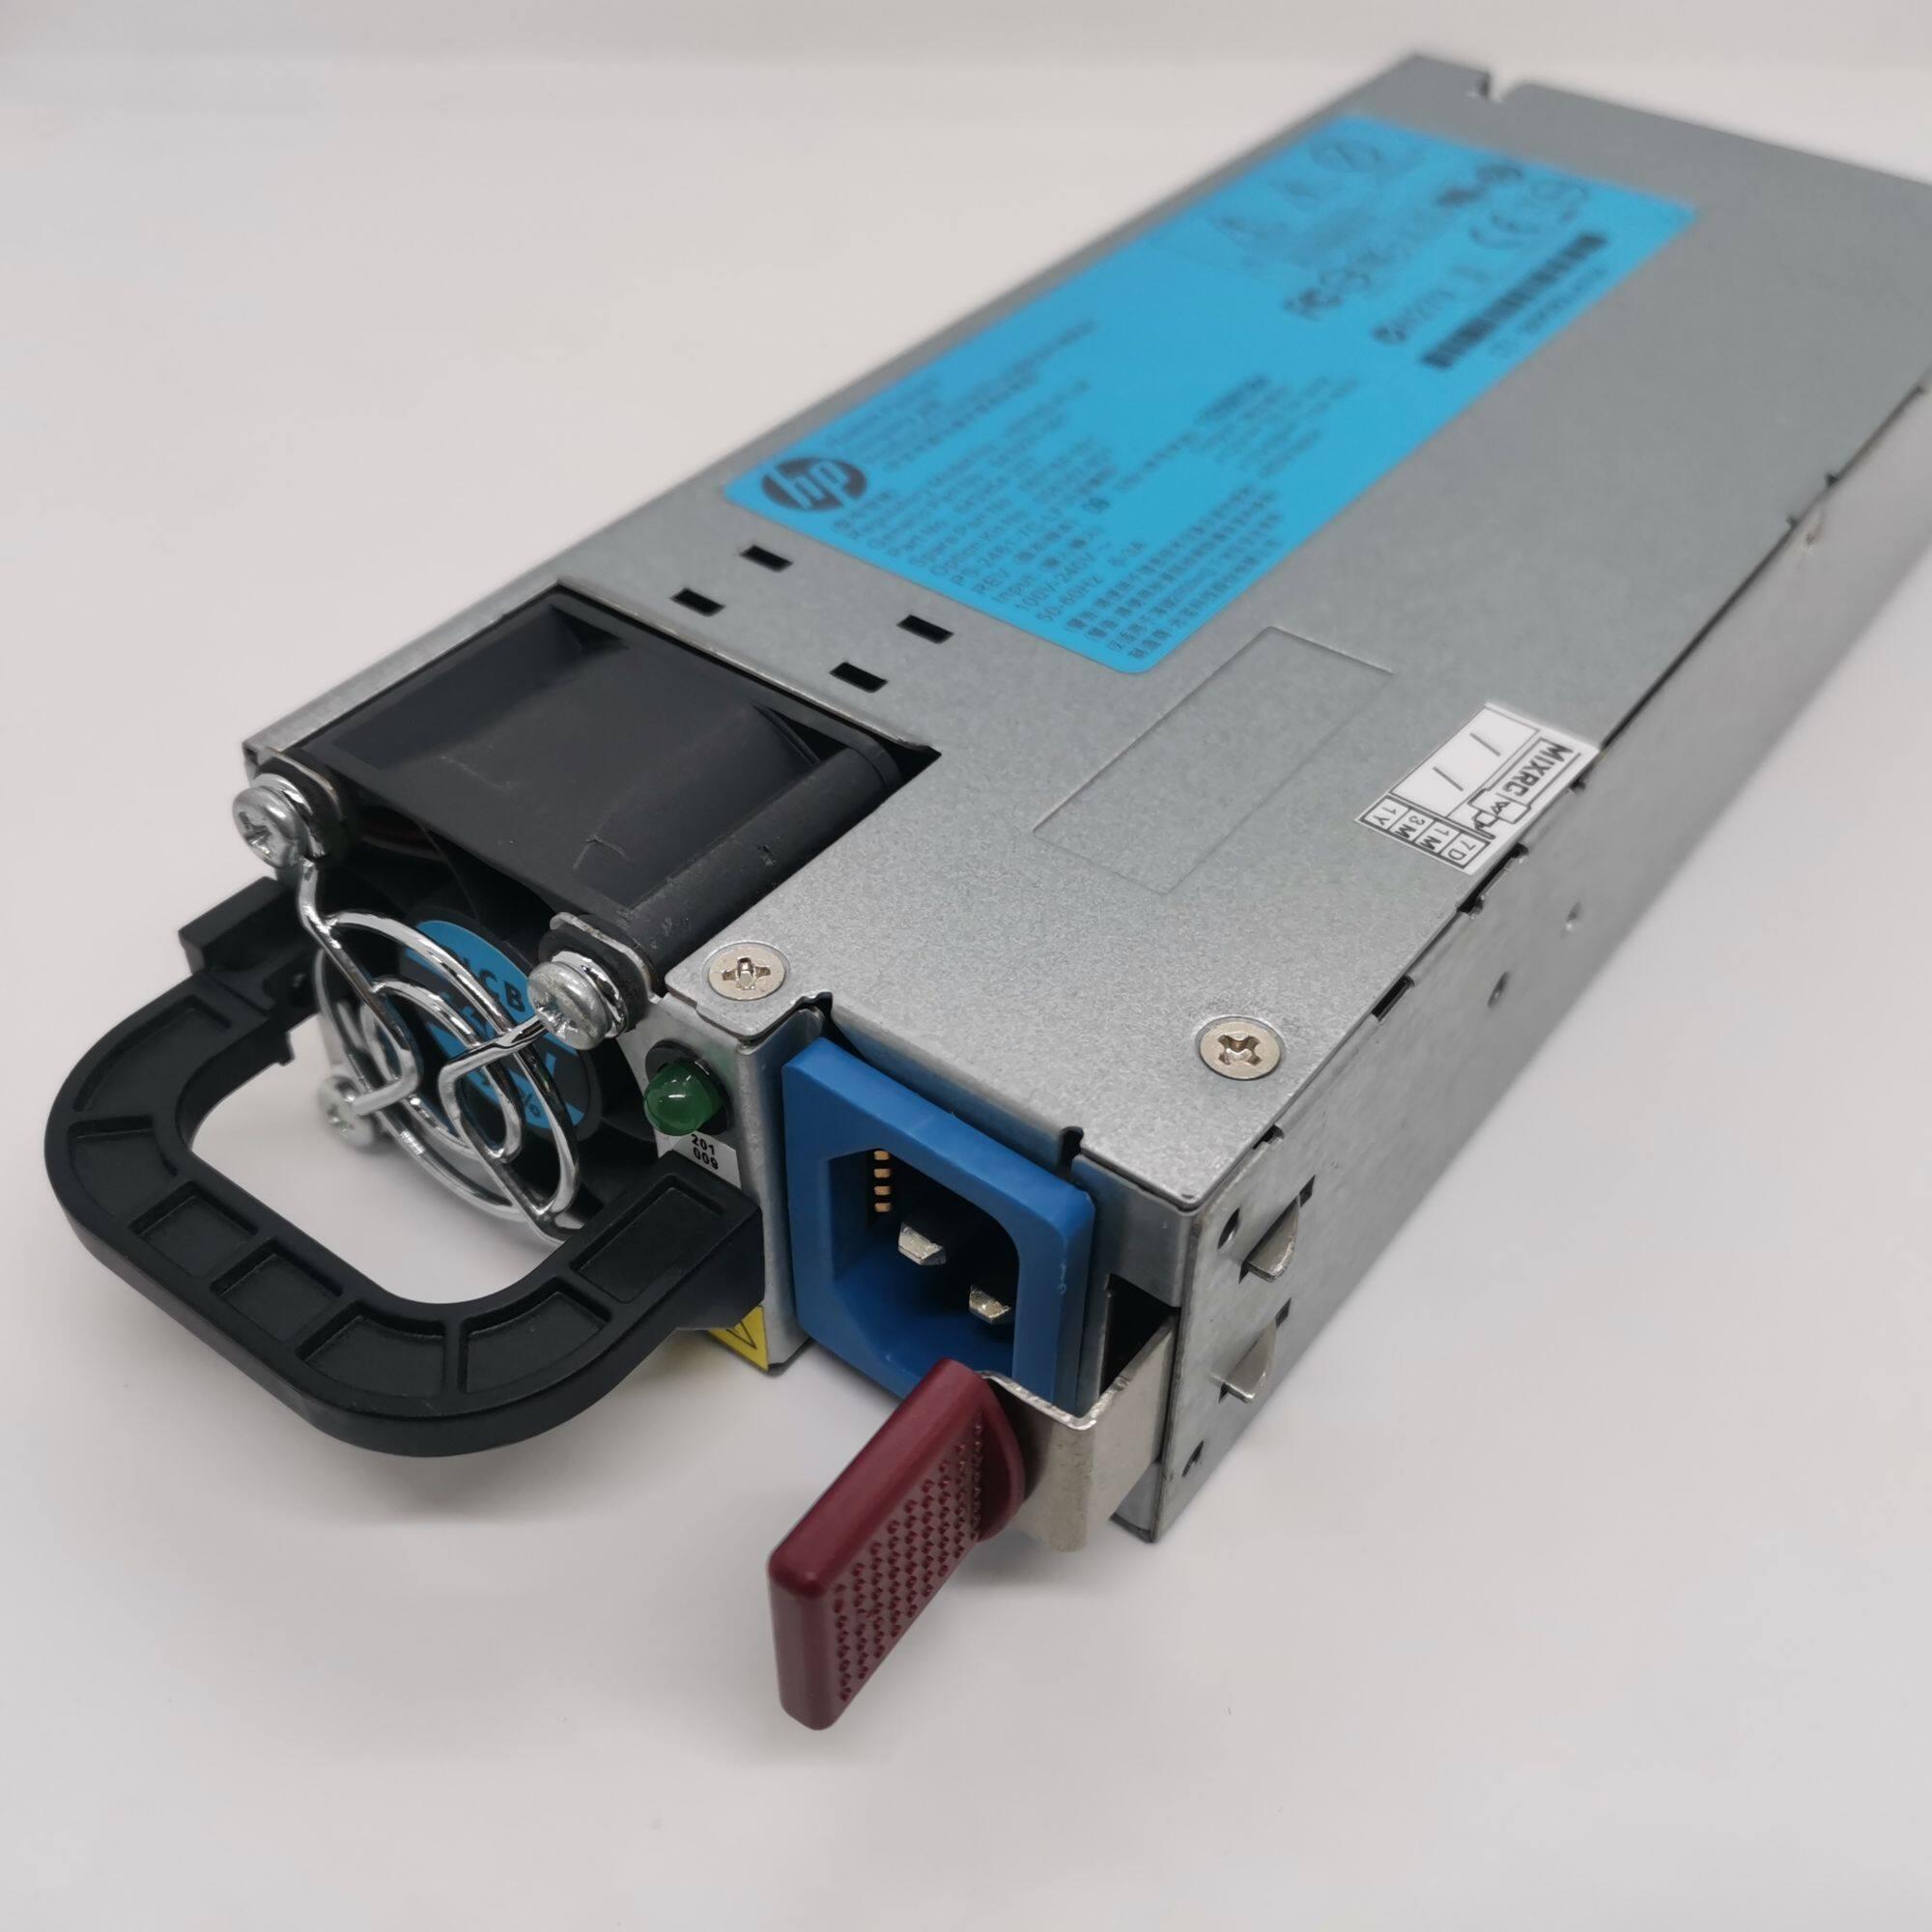 Psu Server 460w Hp Power Supply หม้อแปลง 12v แปลงแล้วเสียบปลั้กจ่ายไฟ 12v ได้เลย.